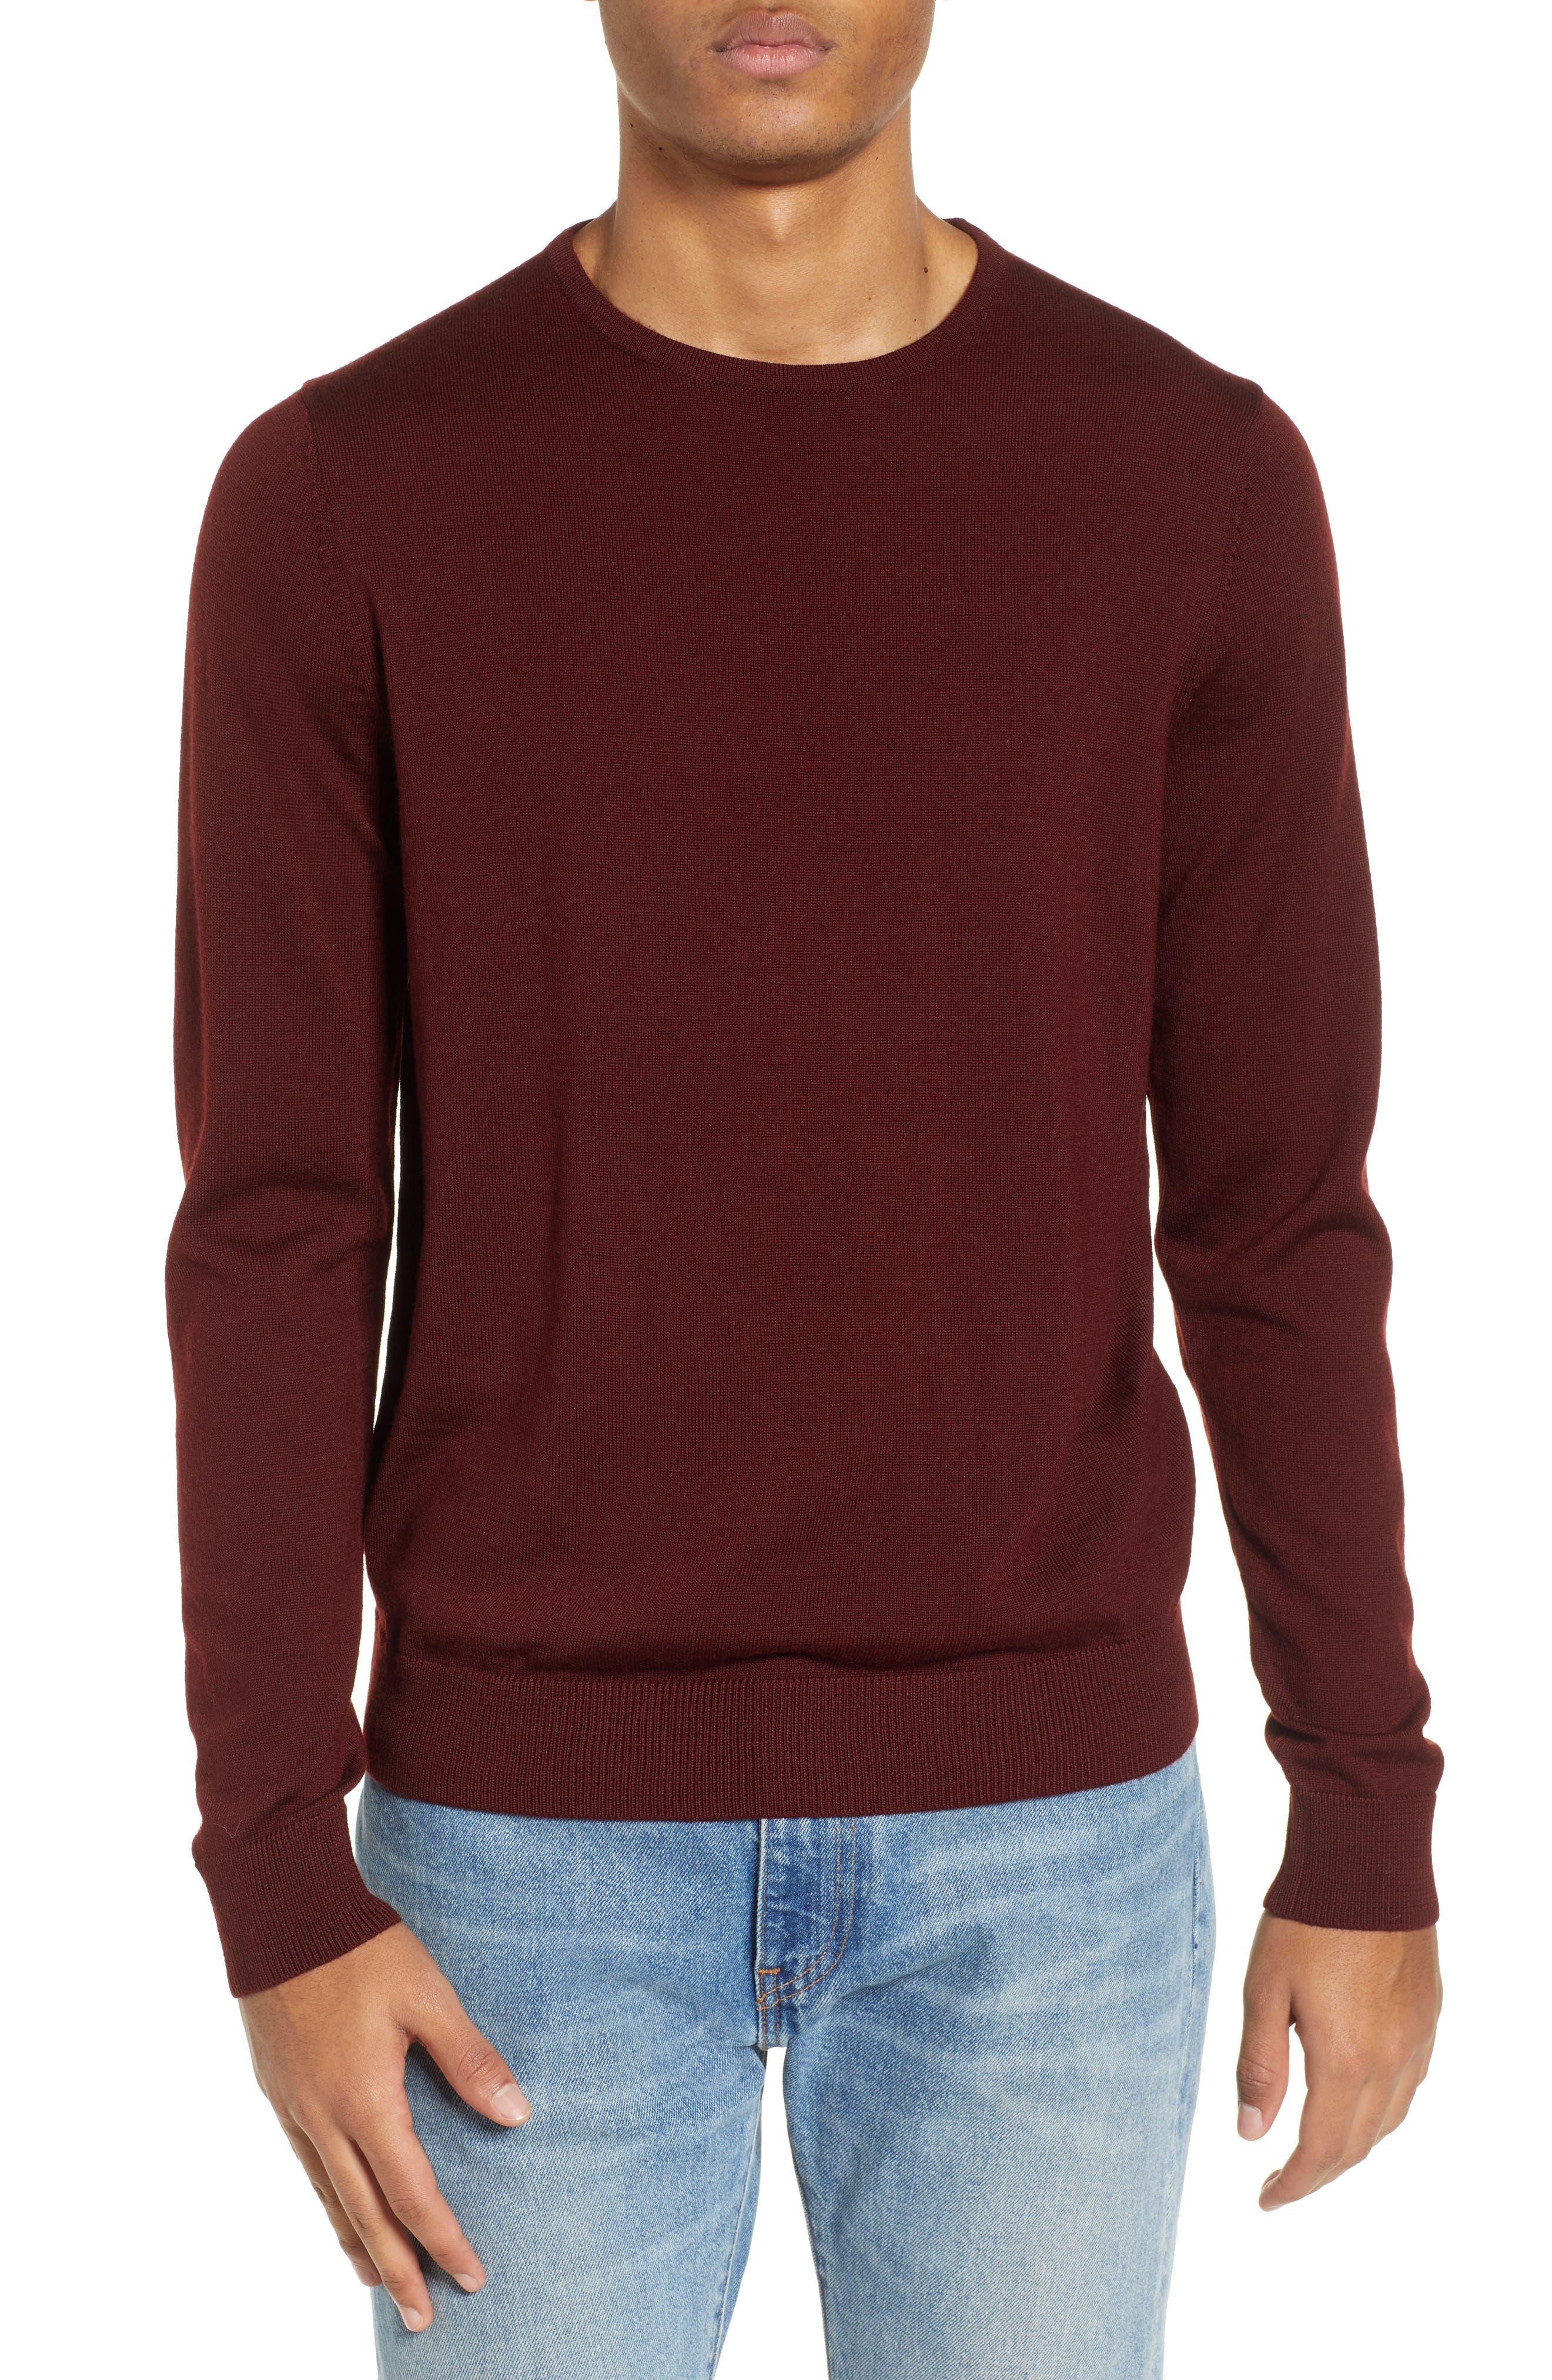 Nordstrom Shop Crewneck Merino Wool Sweater, Burgundy